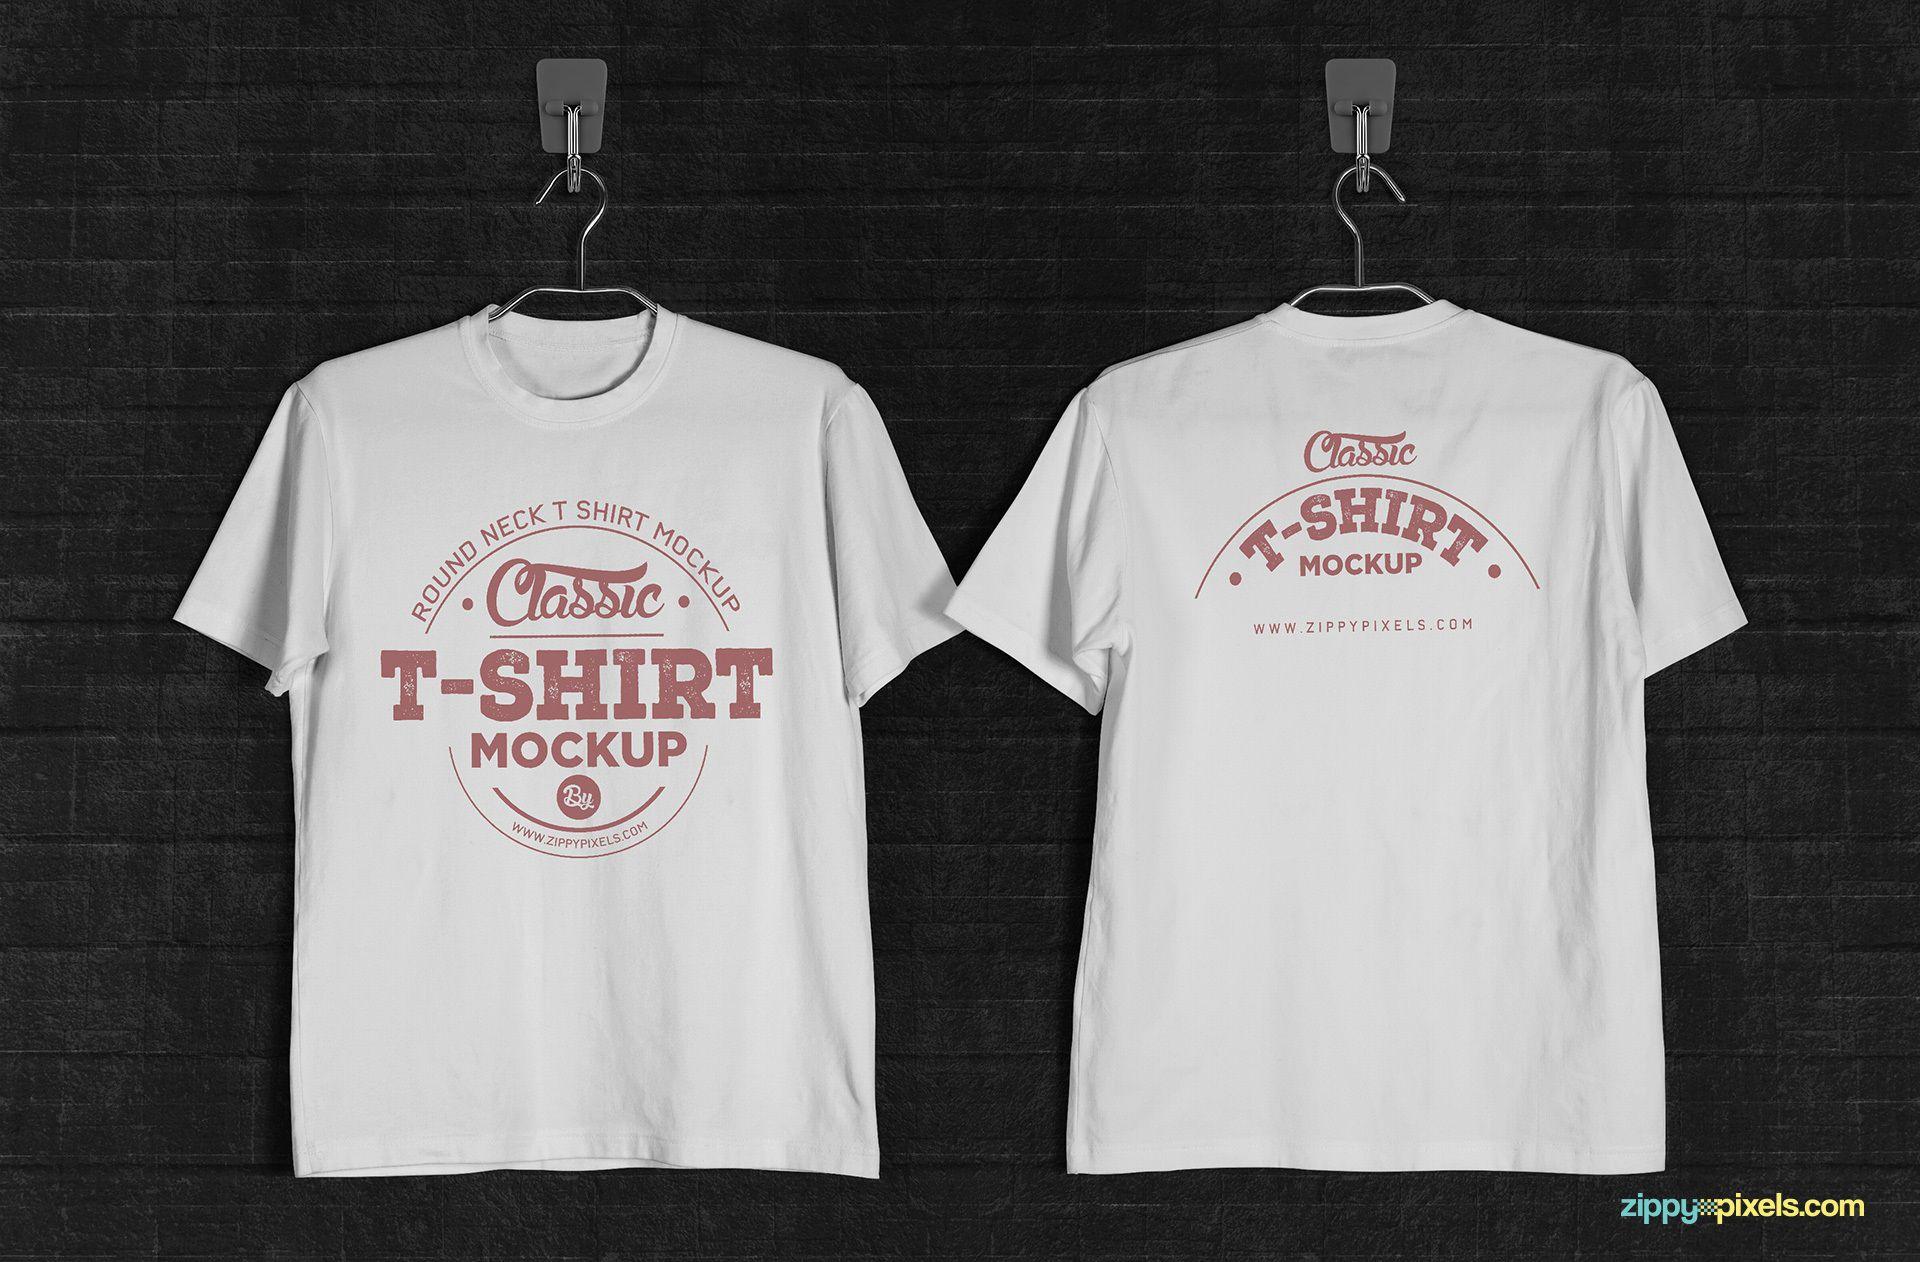 001 Unusual T Shirt Template Psd Idea  Design Mockup Free White CollarFull